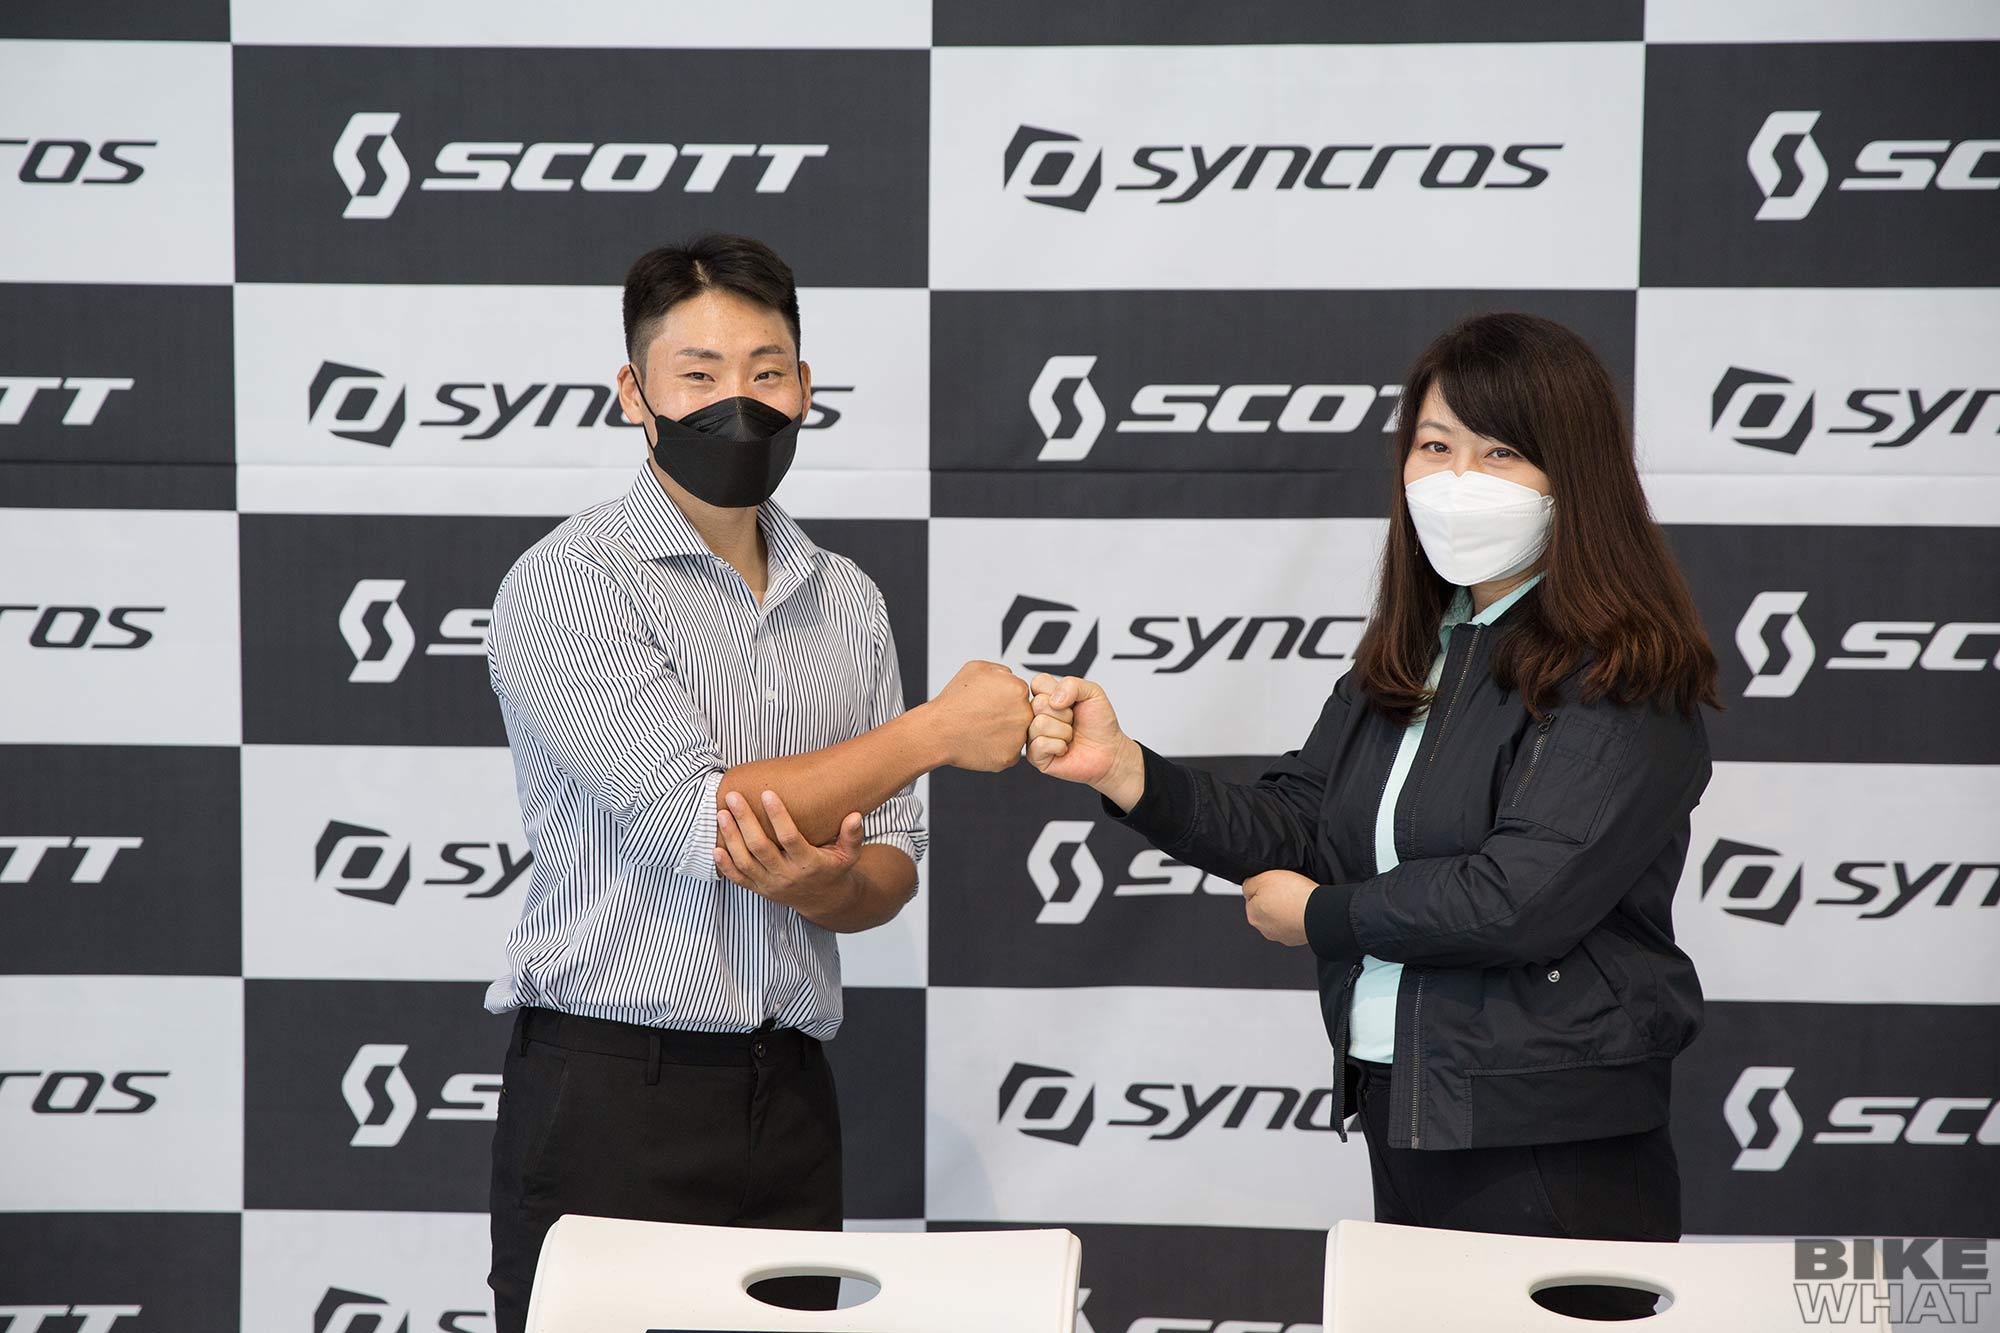 news_scott-north-asia-support-2021-korea-national-champion_2